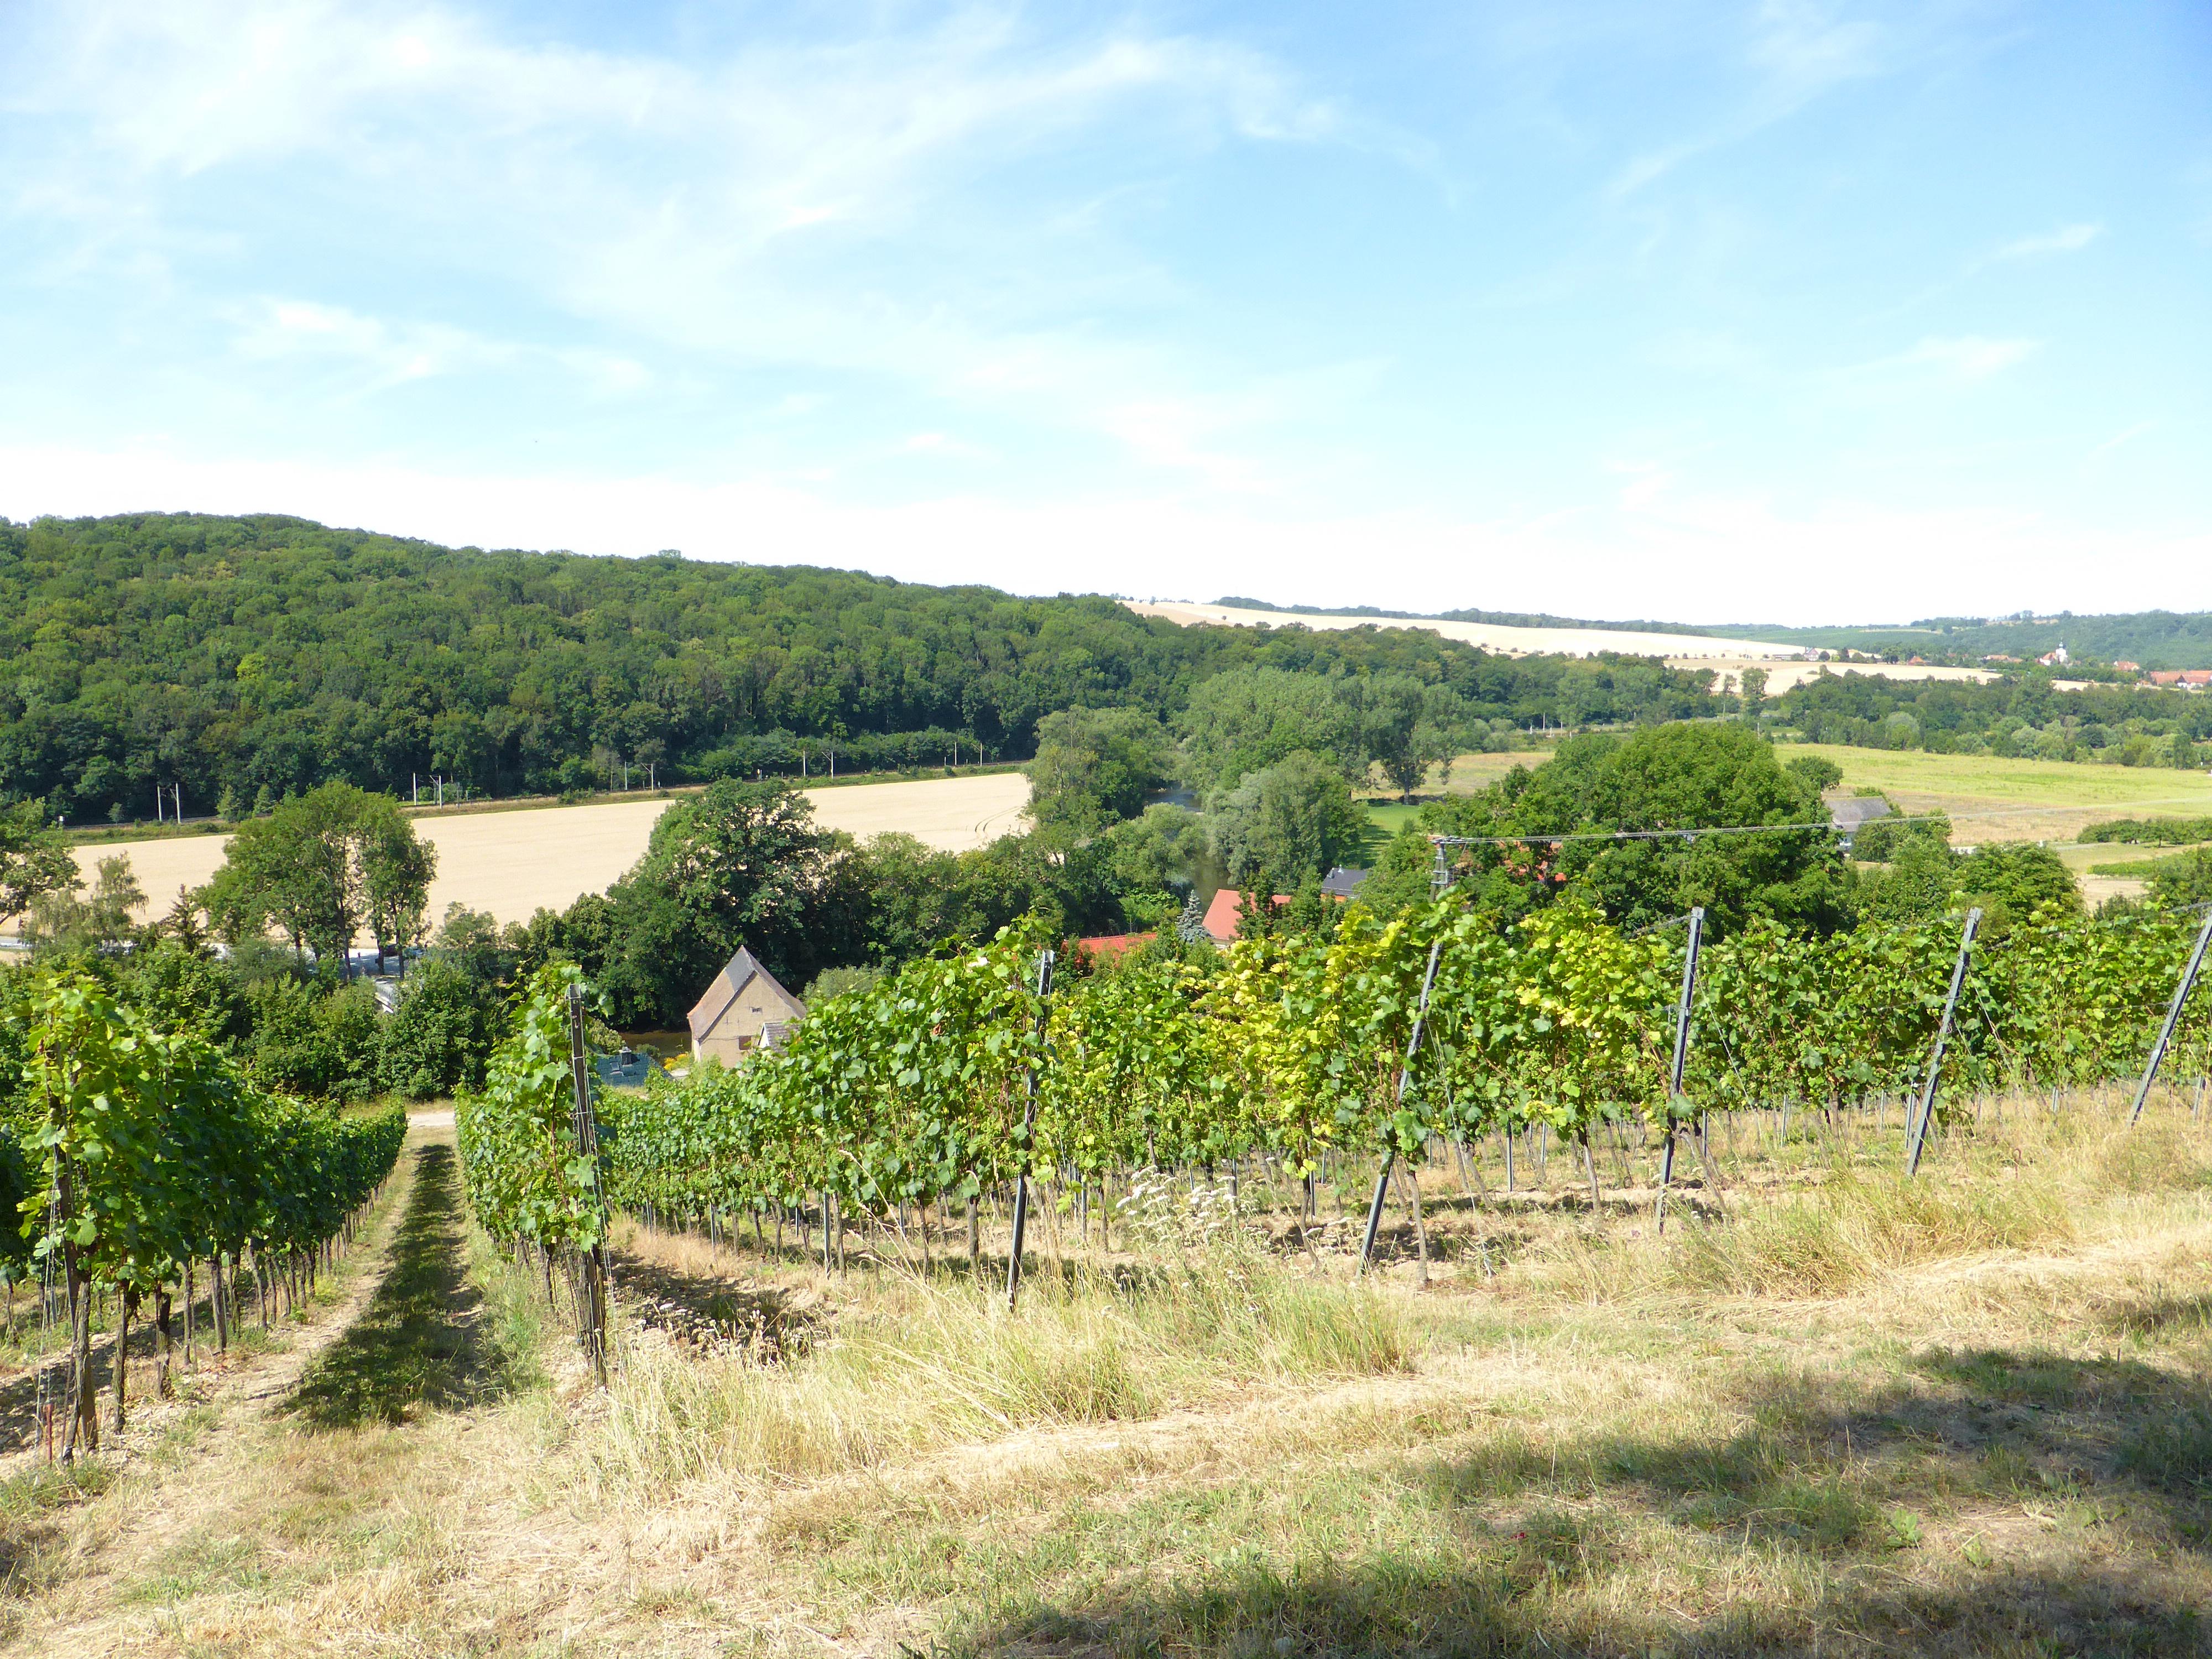 Weingut Zahn, RAG Weimarer Land - Mittelthüringen e.V.